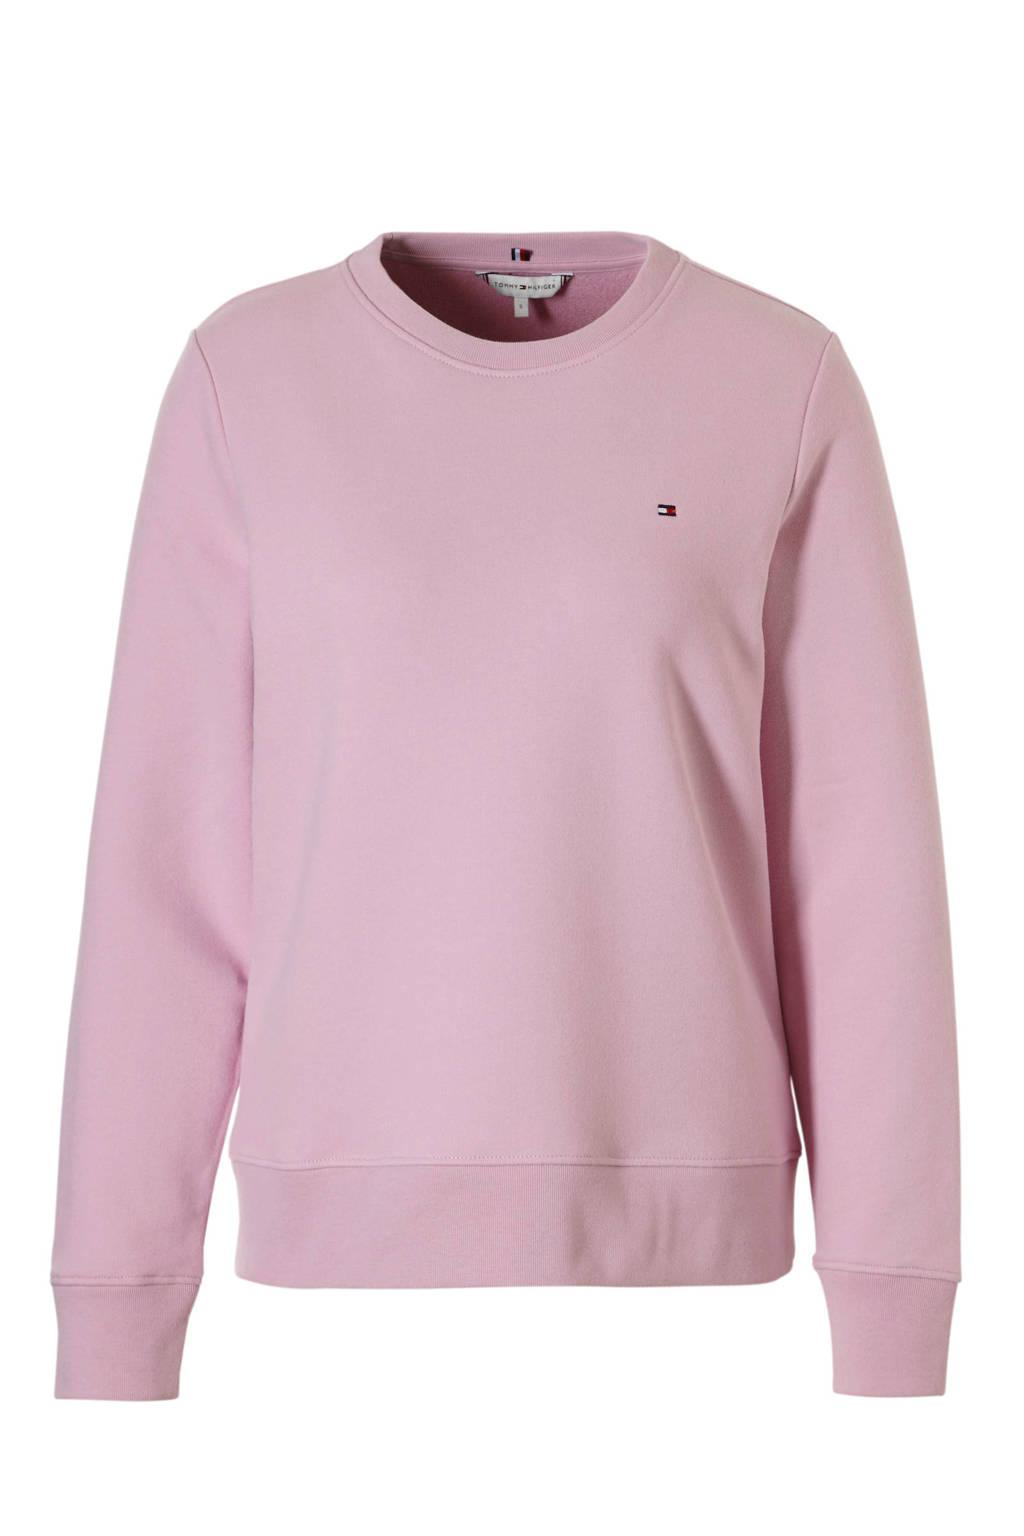 Tommy Hilfiger Claire sweater roze, Roze